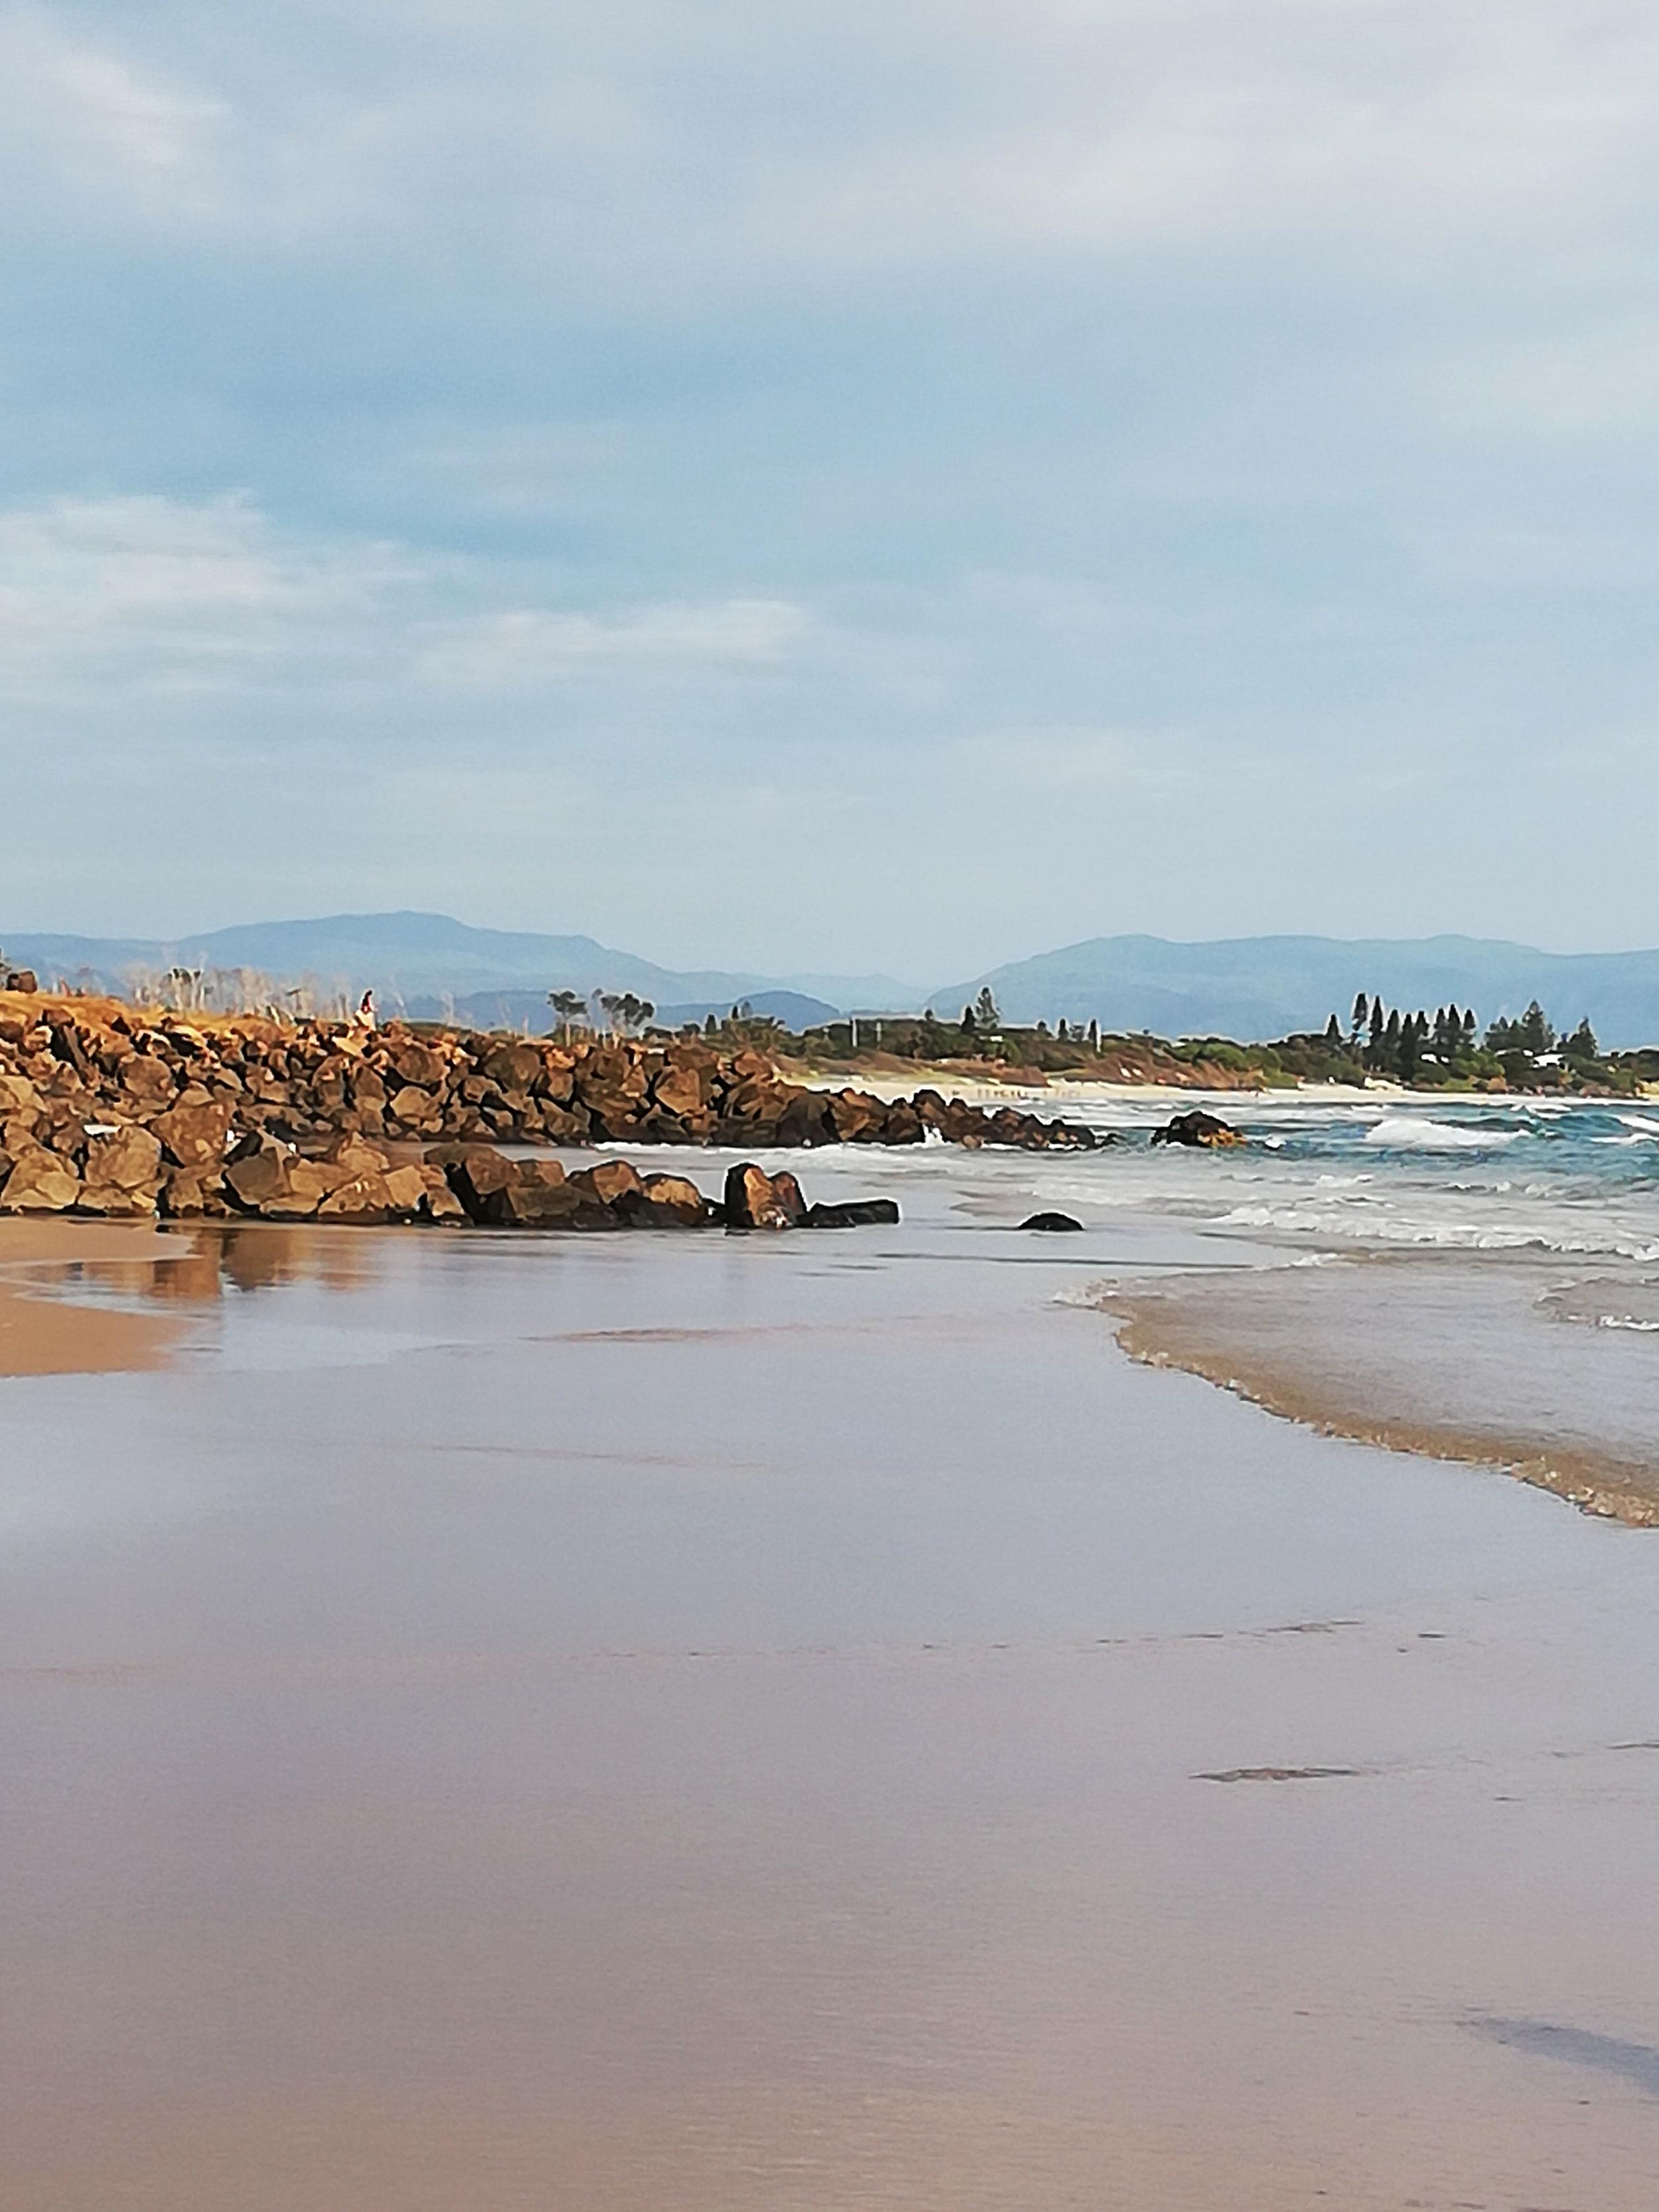 Byron Bay in NSW